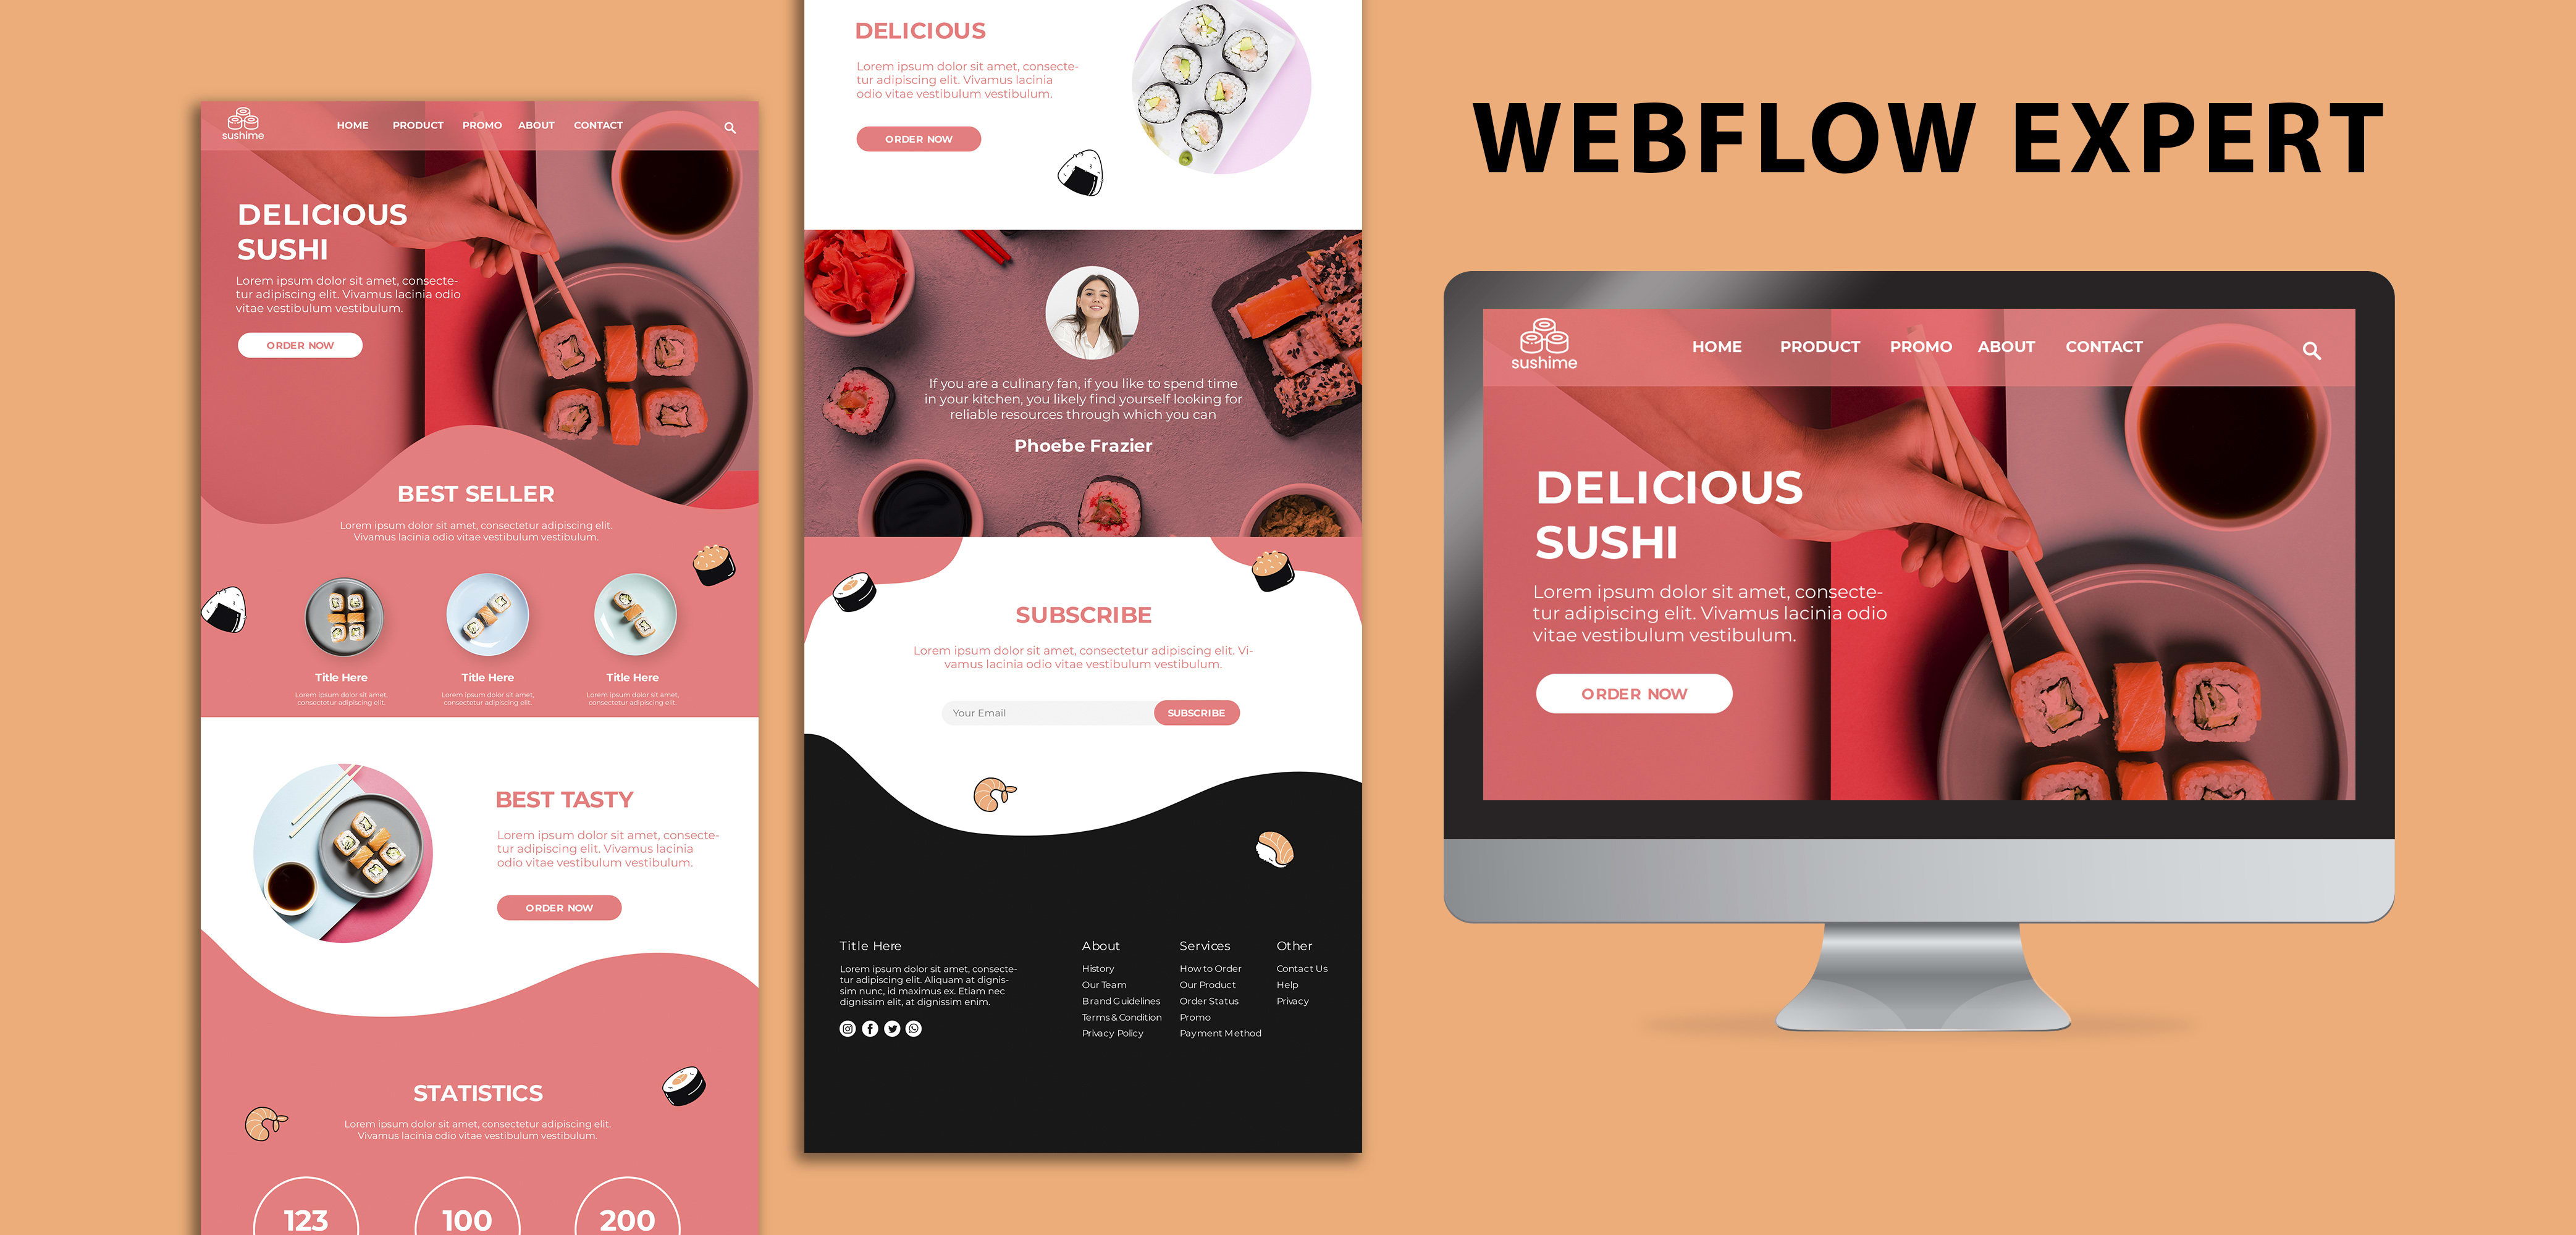 Website development Wordpress | Joomla| Magento | Wix| Woo commerce| Html | Shopify